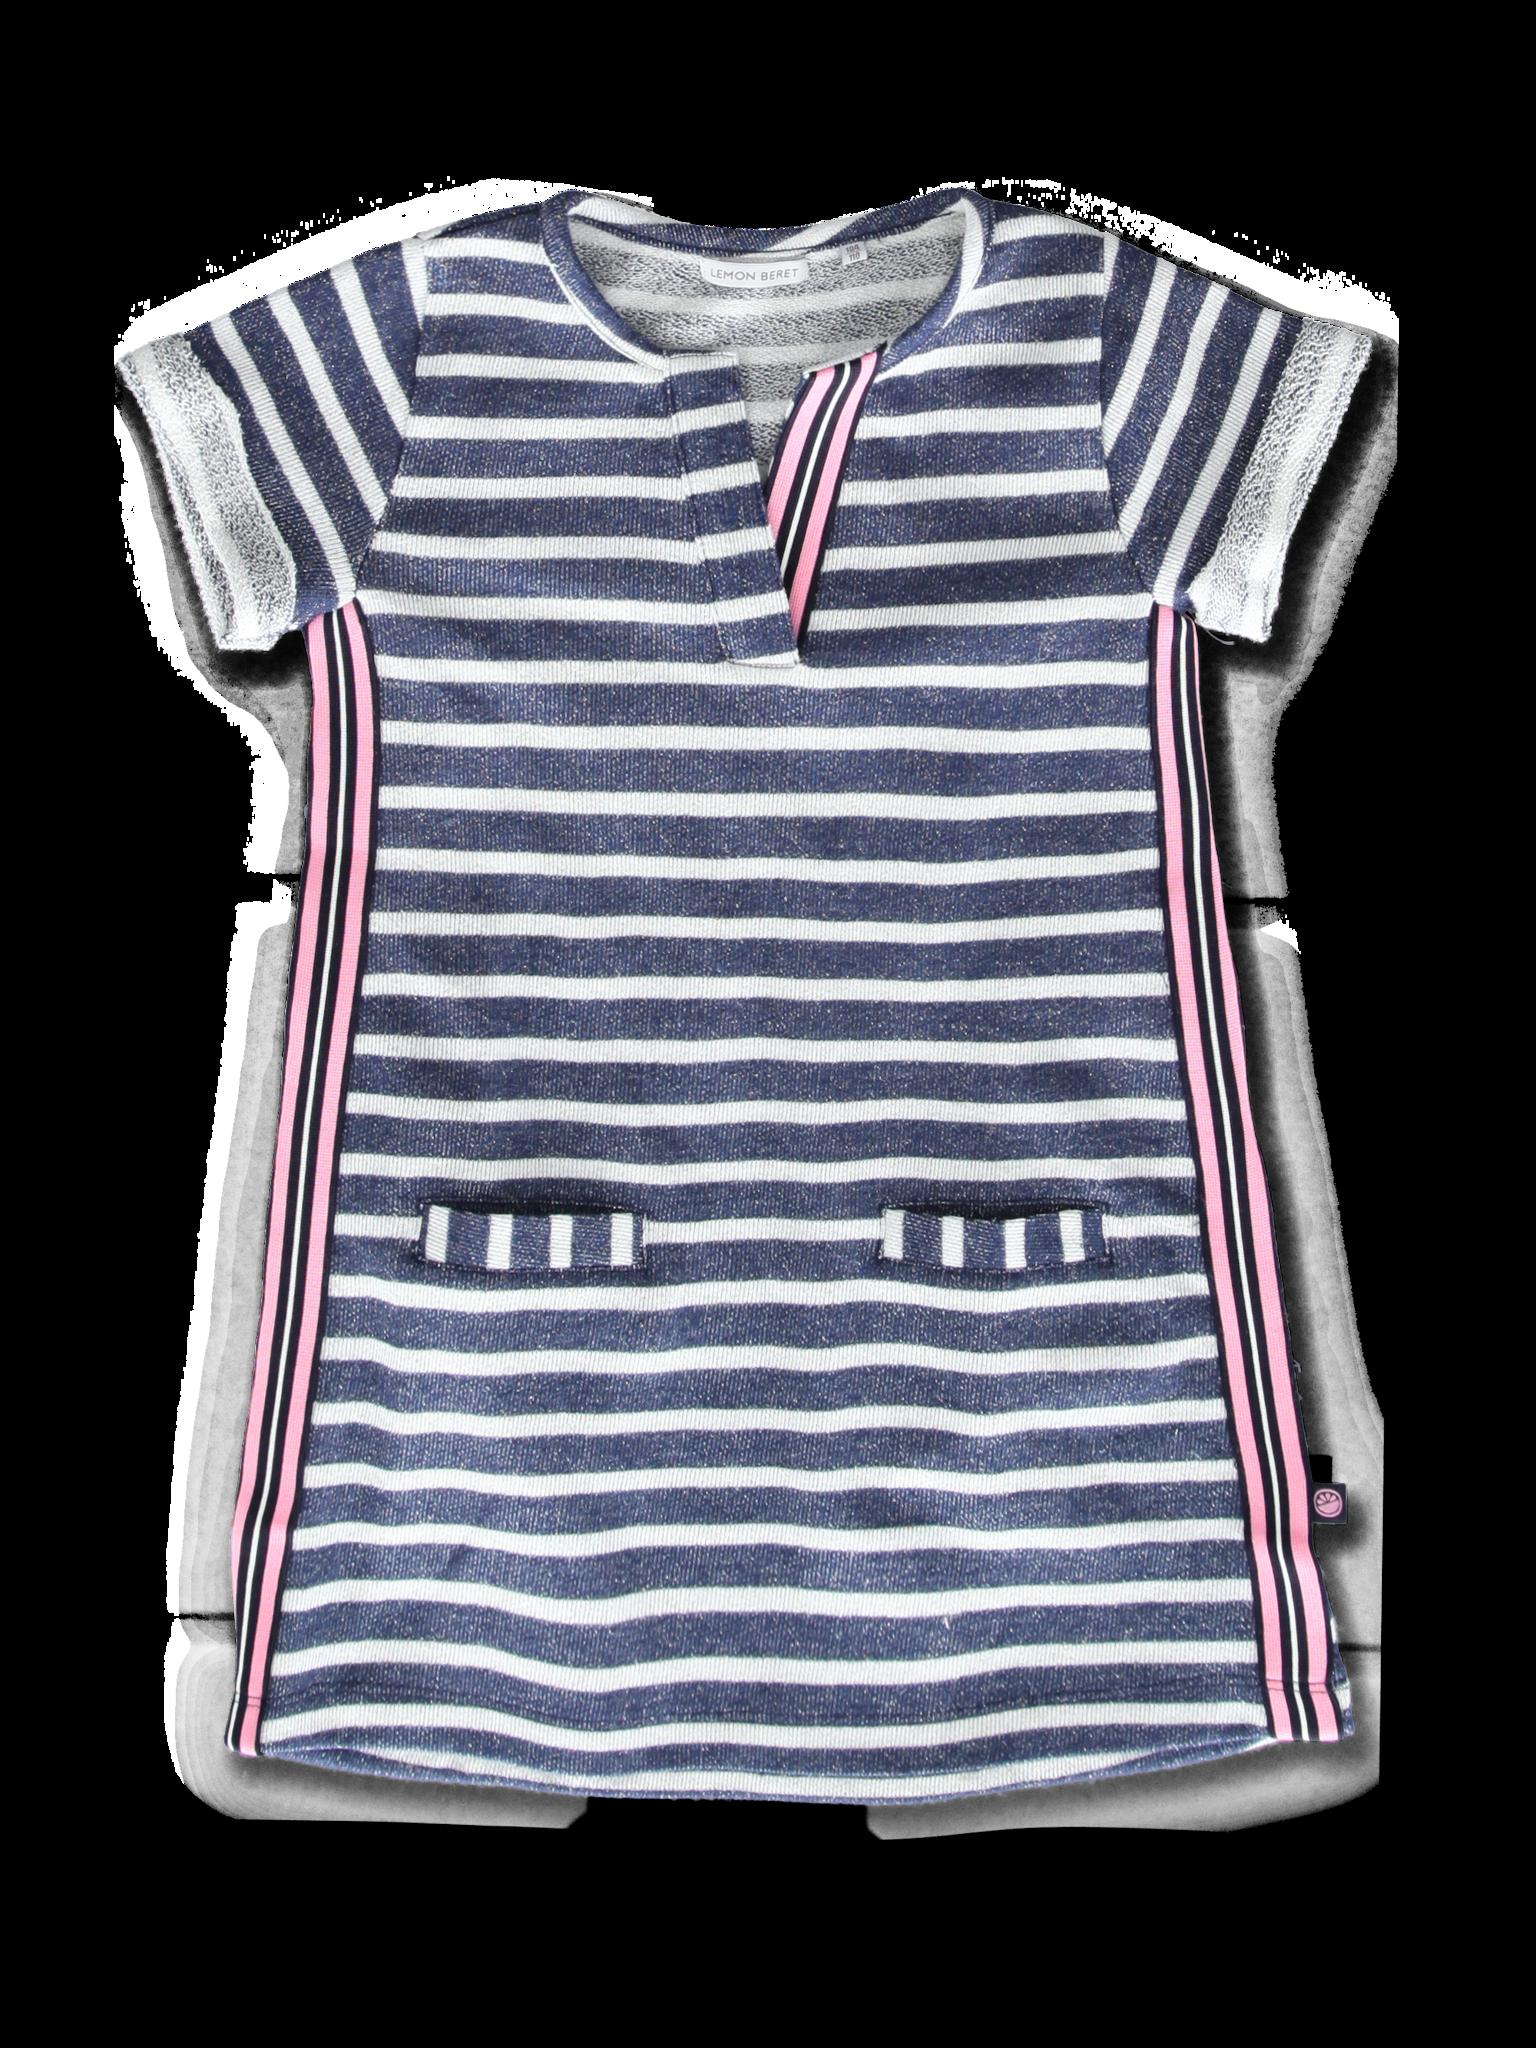 Lemon Beret | Summer 2020 Small Girls | Dress | 12 pcs/box